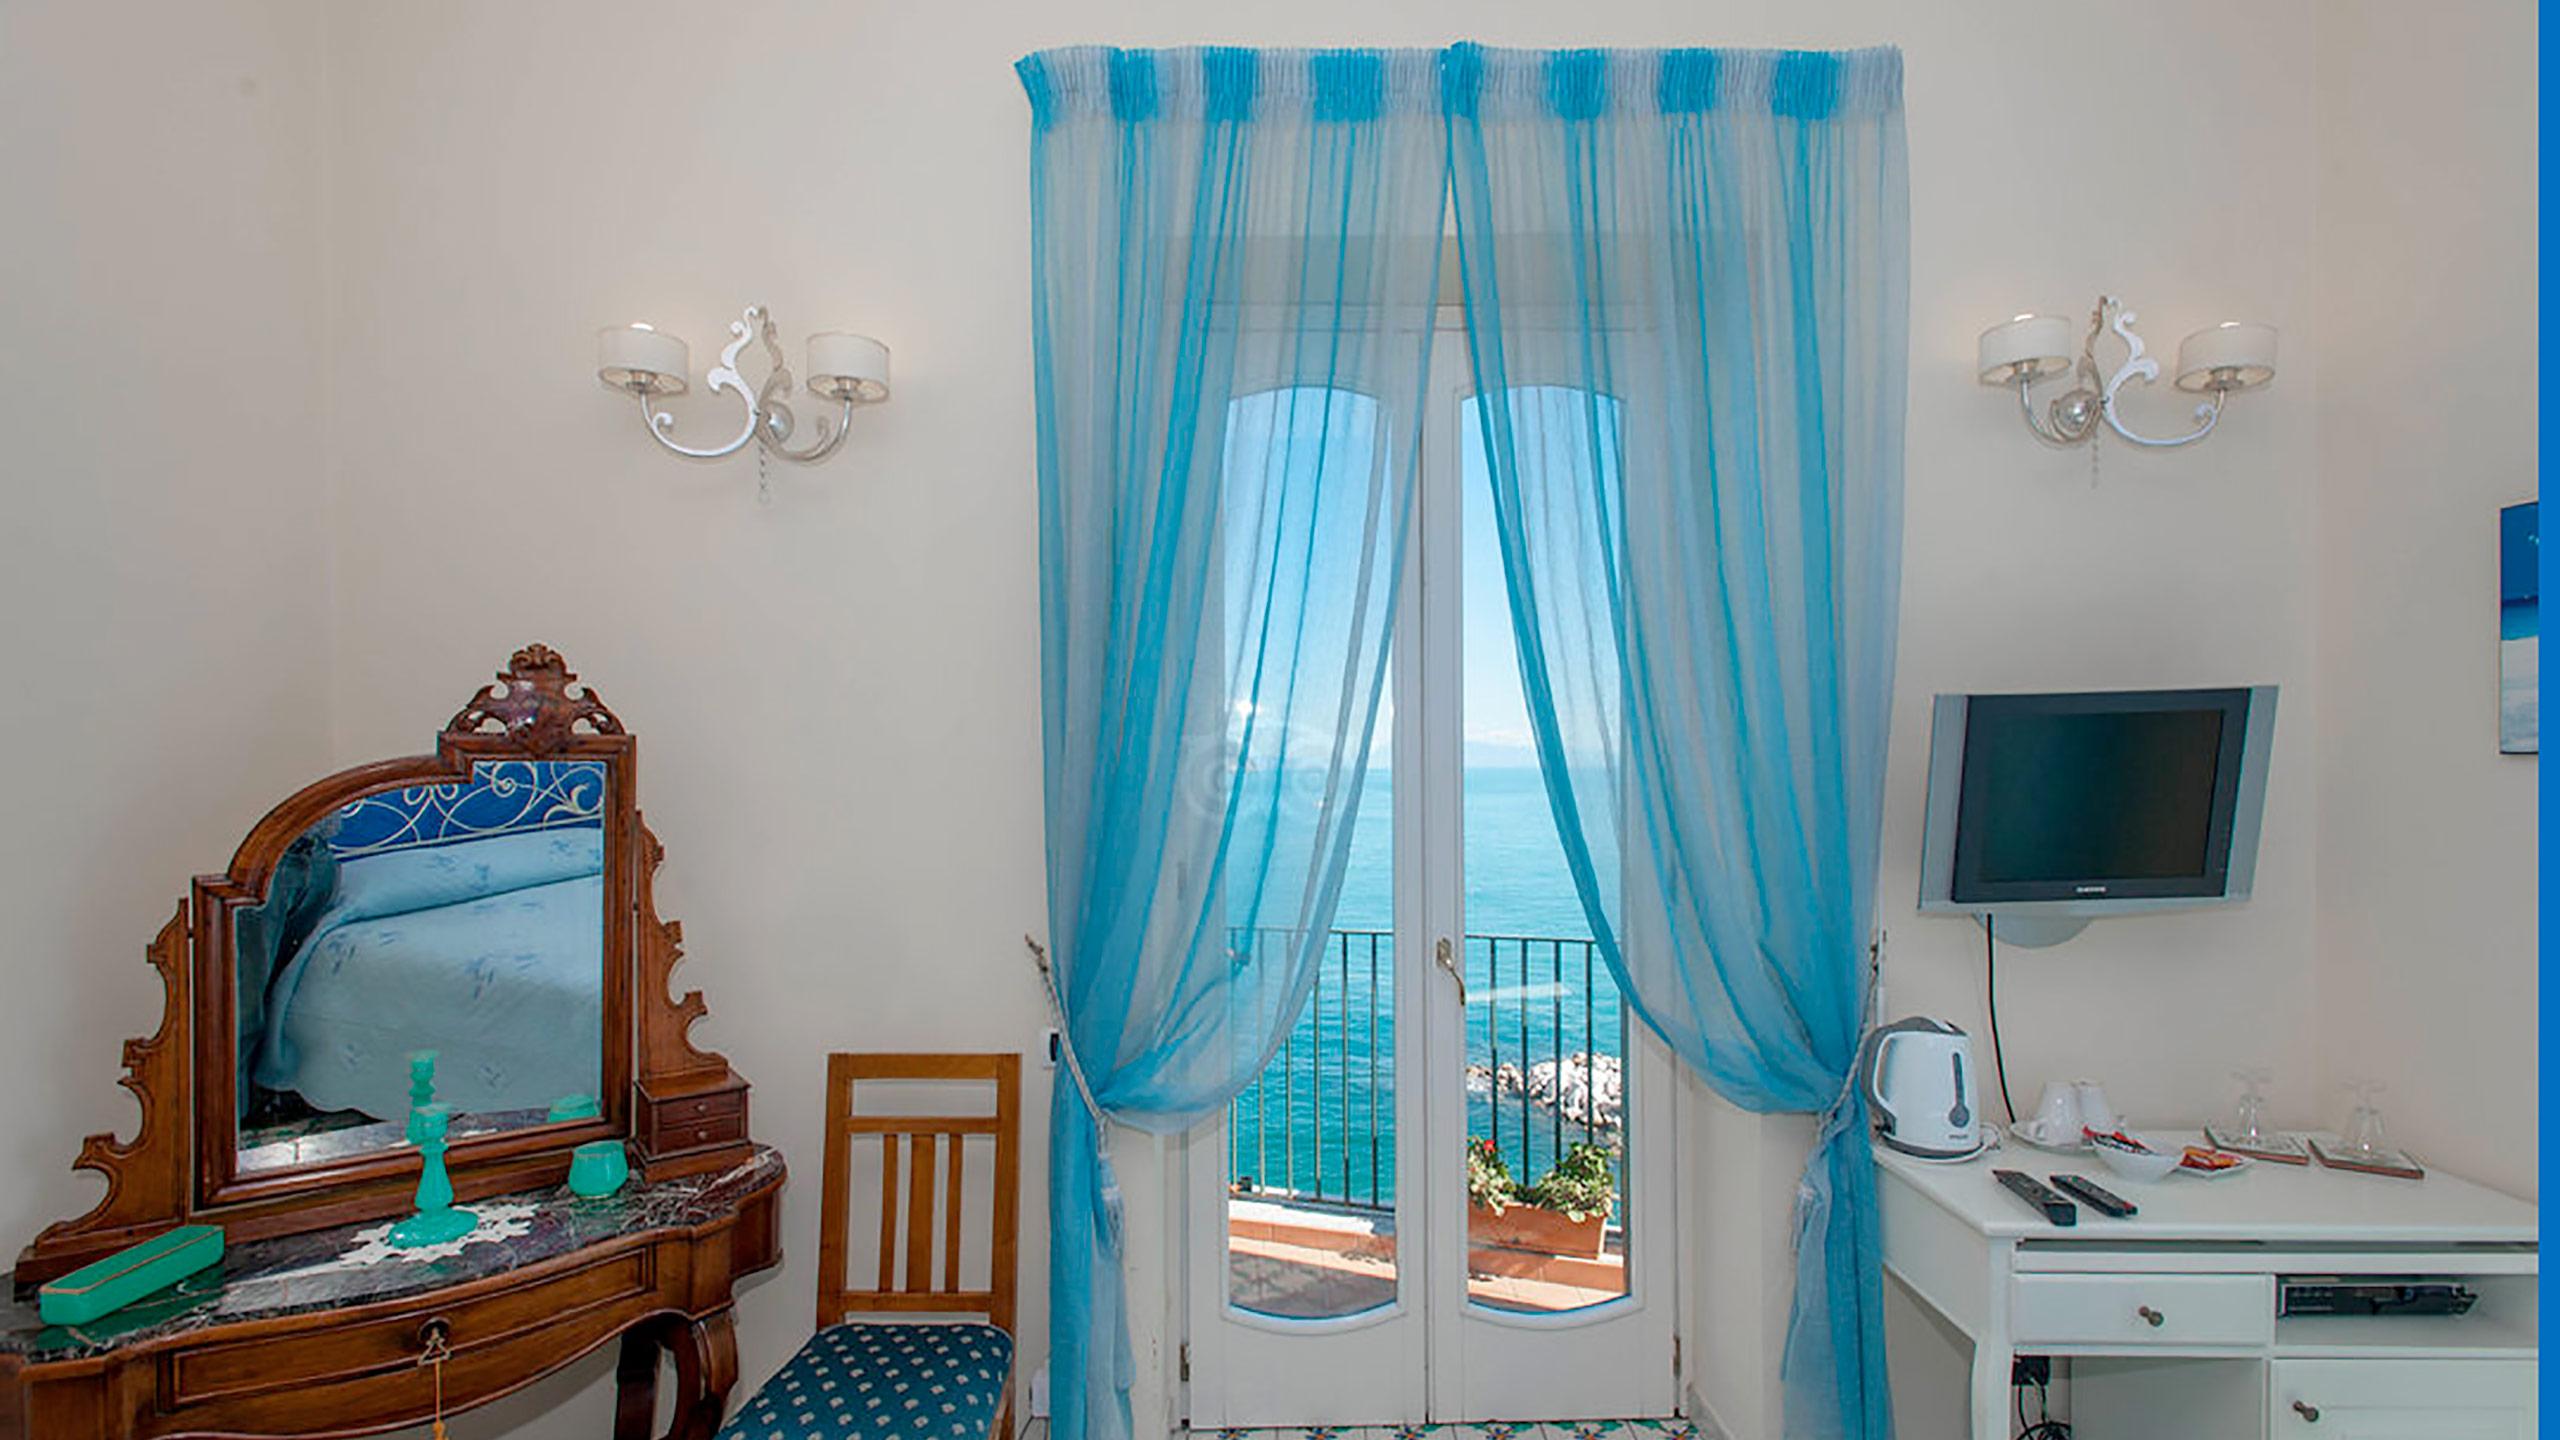 la-rondine-room--v10056897-(1)